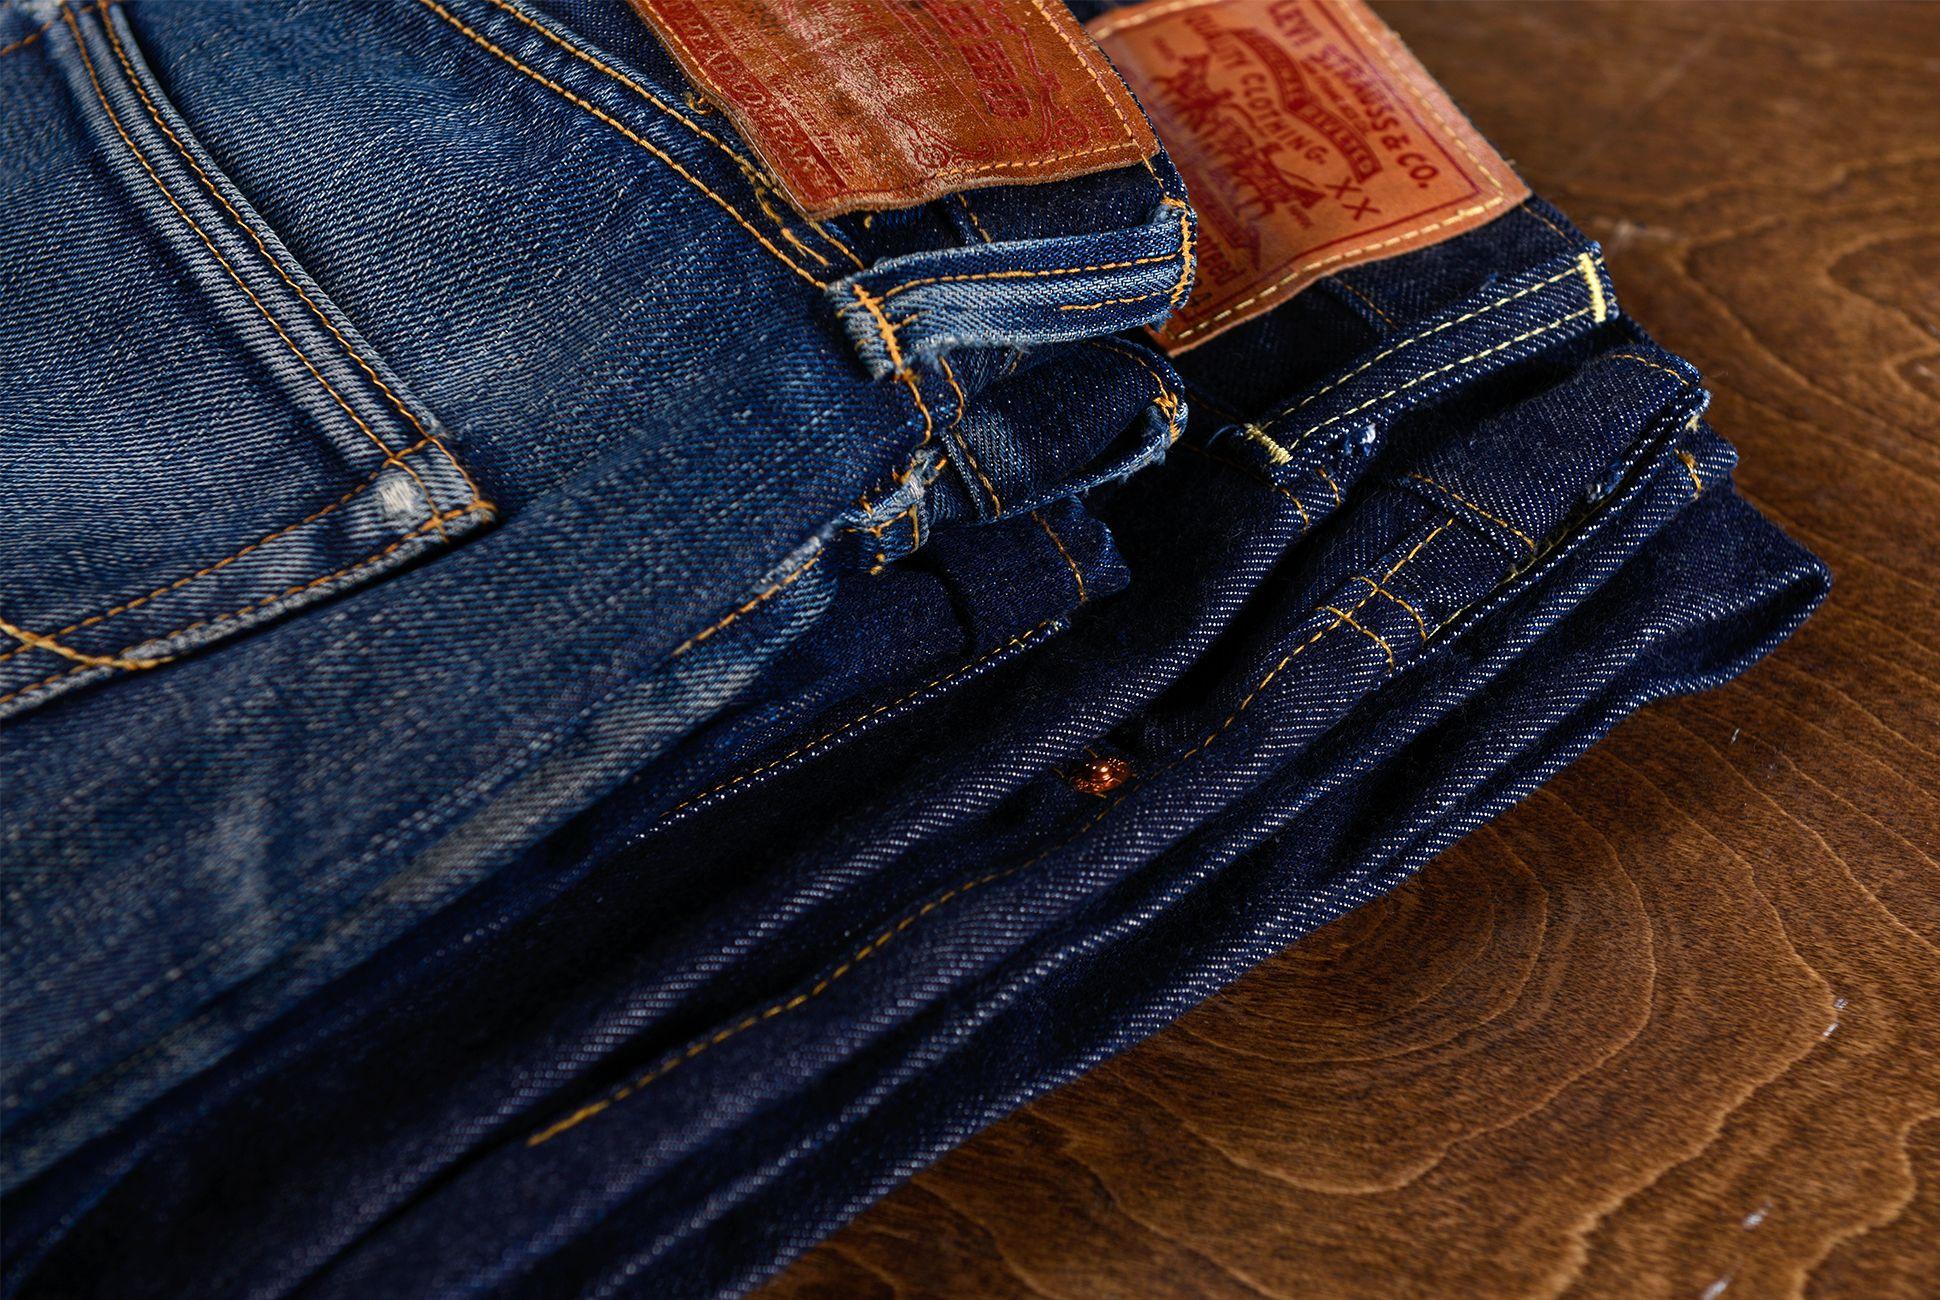 quality-jeans-gear-patrol-970-3